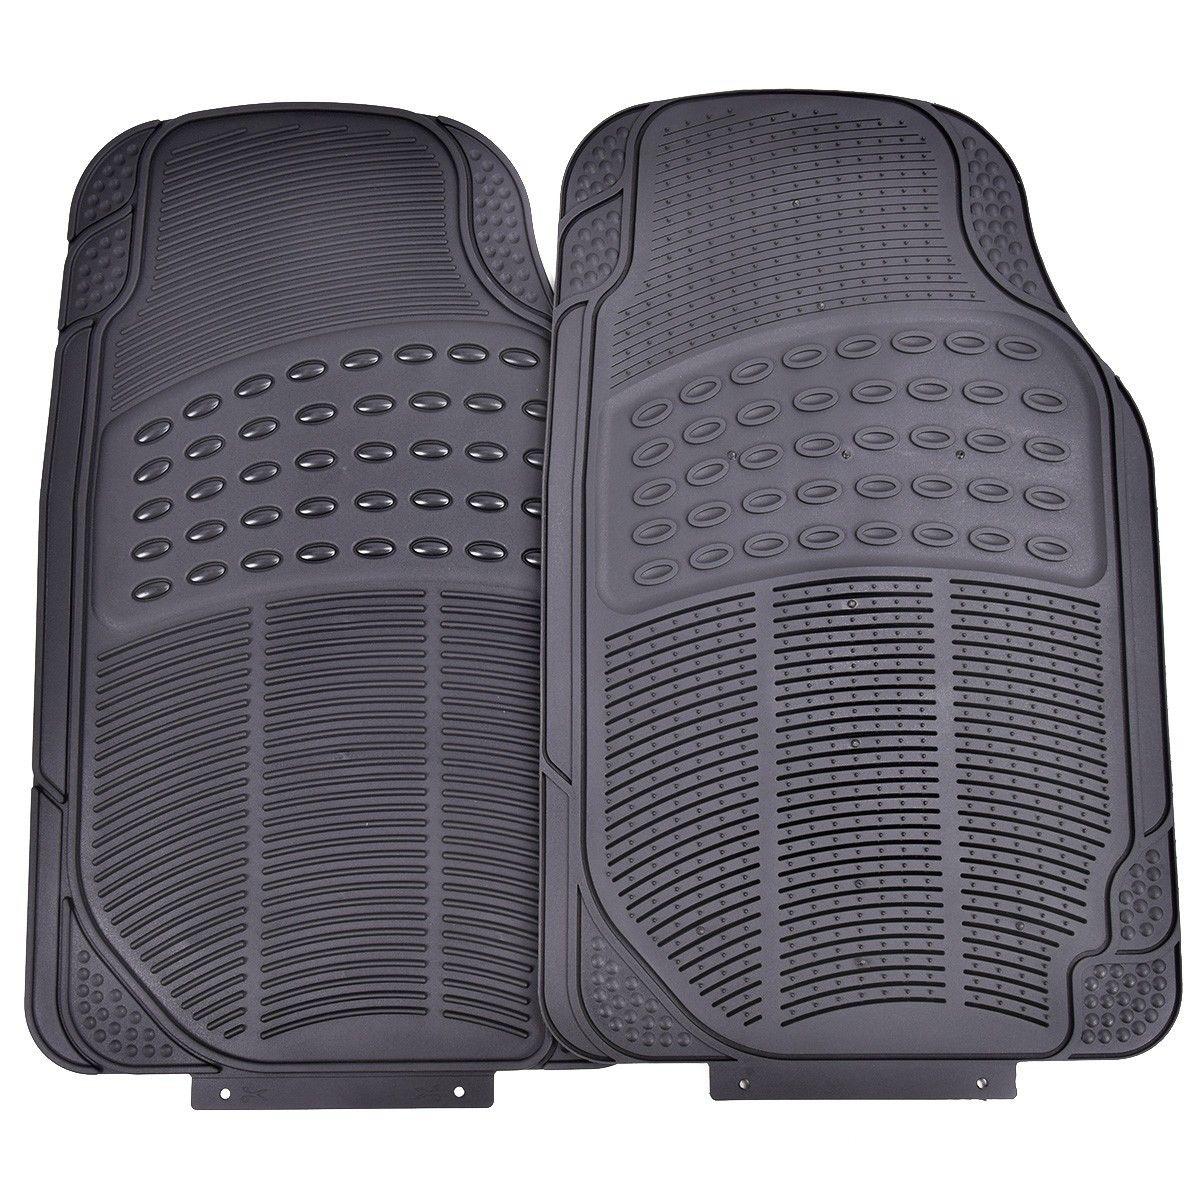 3PC Universal Car Van Front &Rear Floor Mats All Weather Heavy Duty PVC Protect-Black